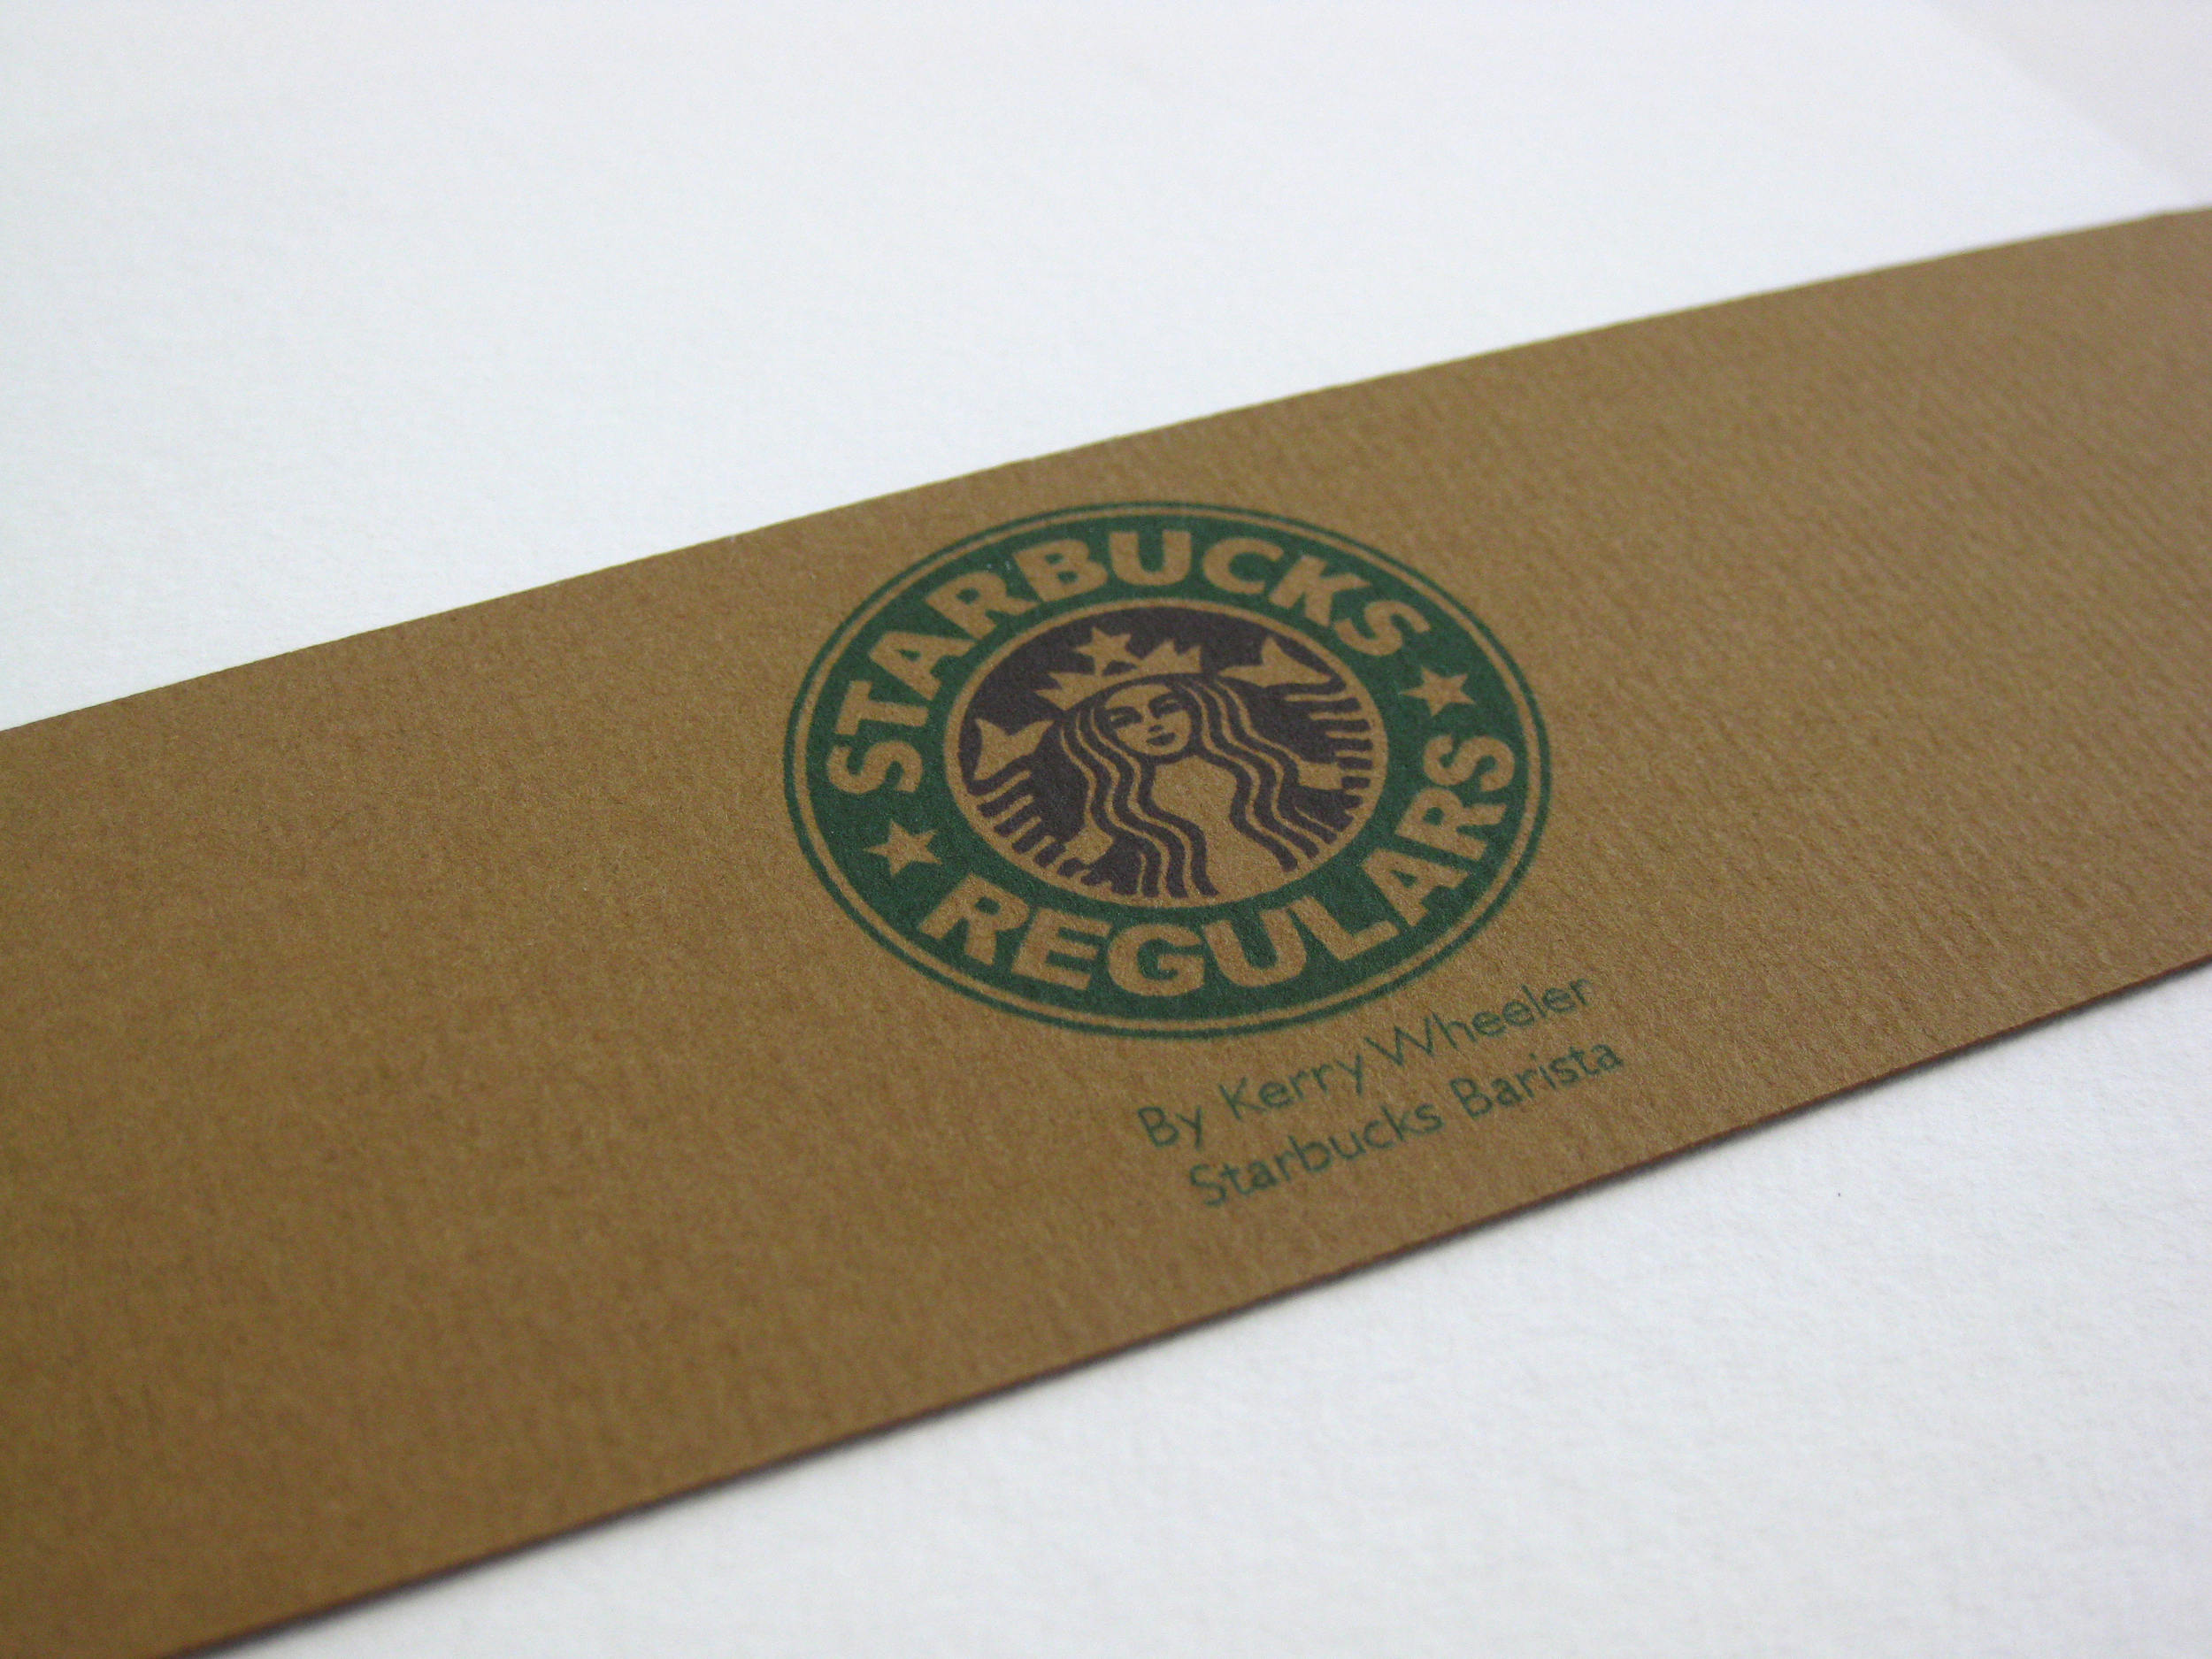 Starbucks Regulars